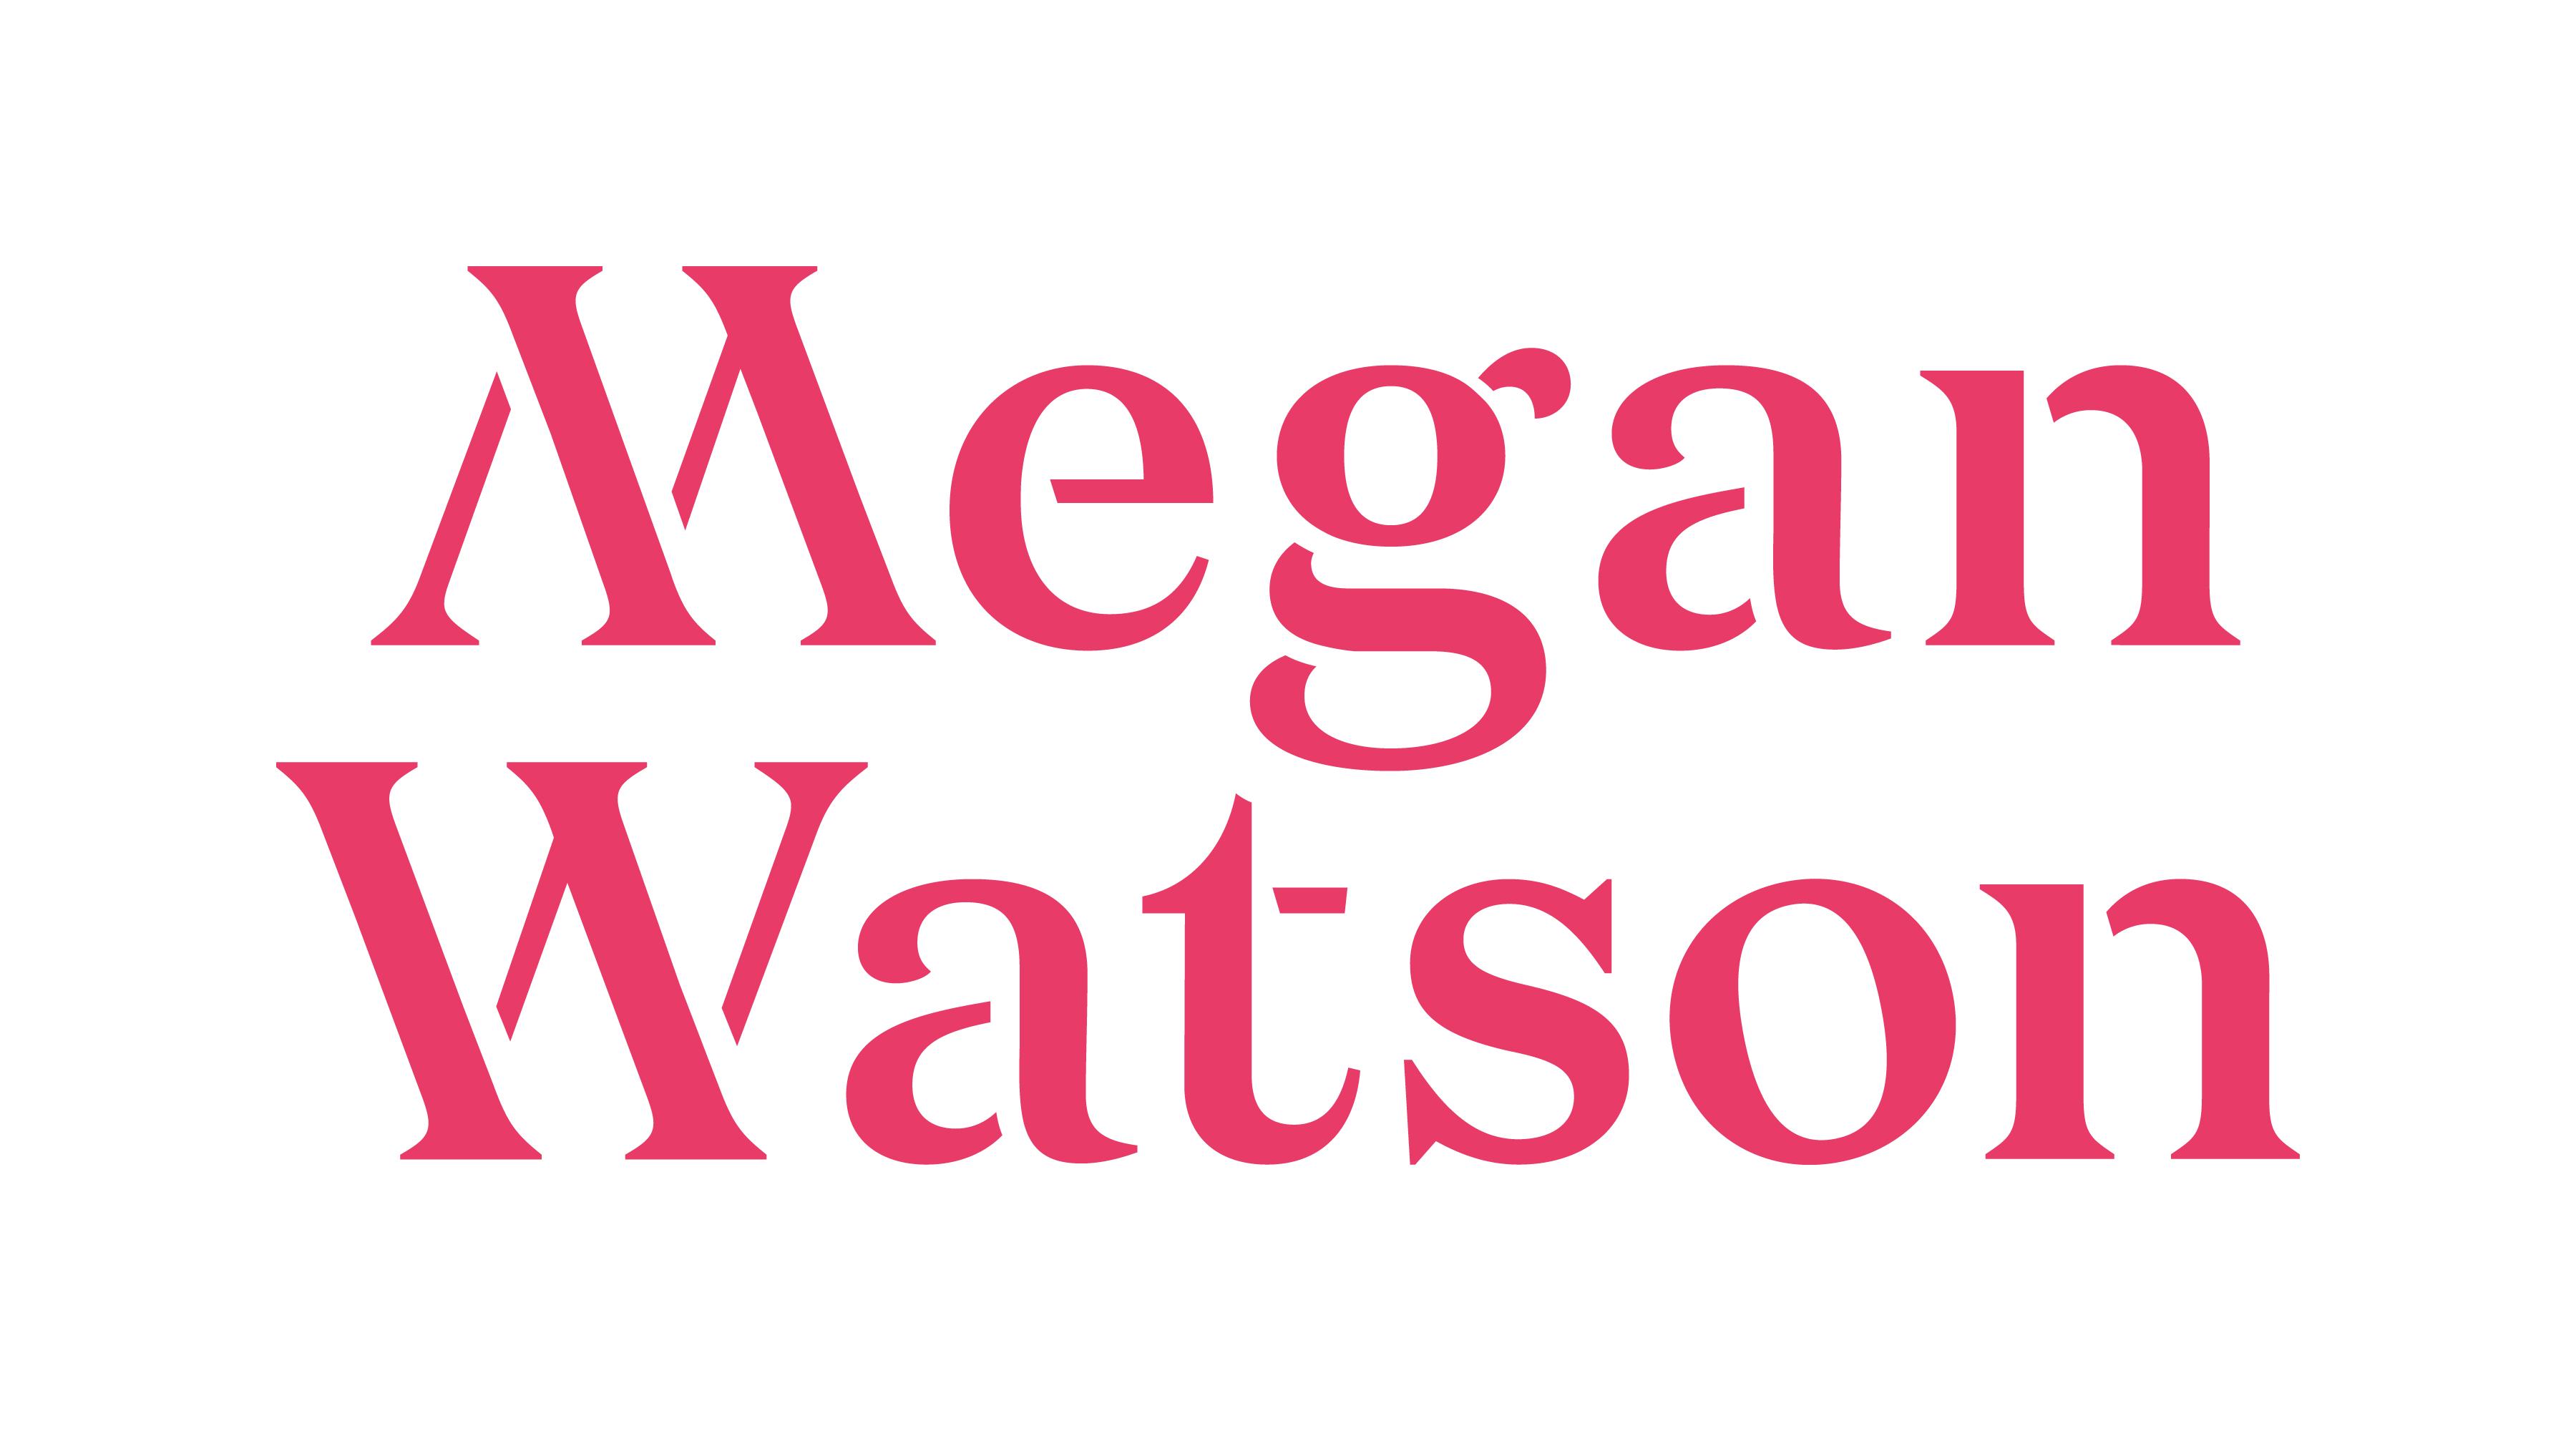 Visual Identity - Megan Watson